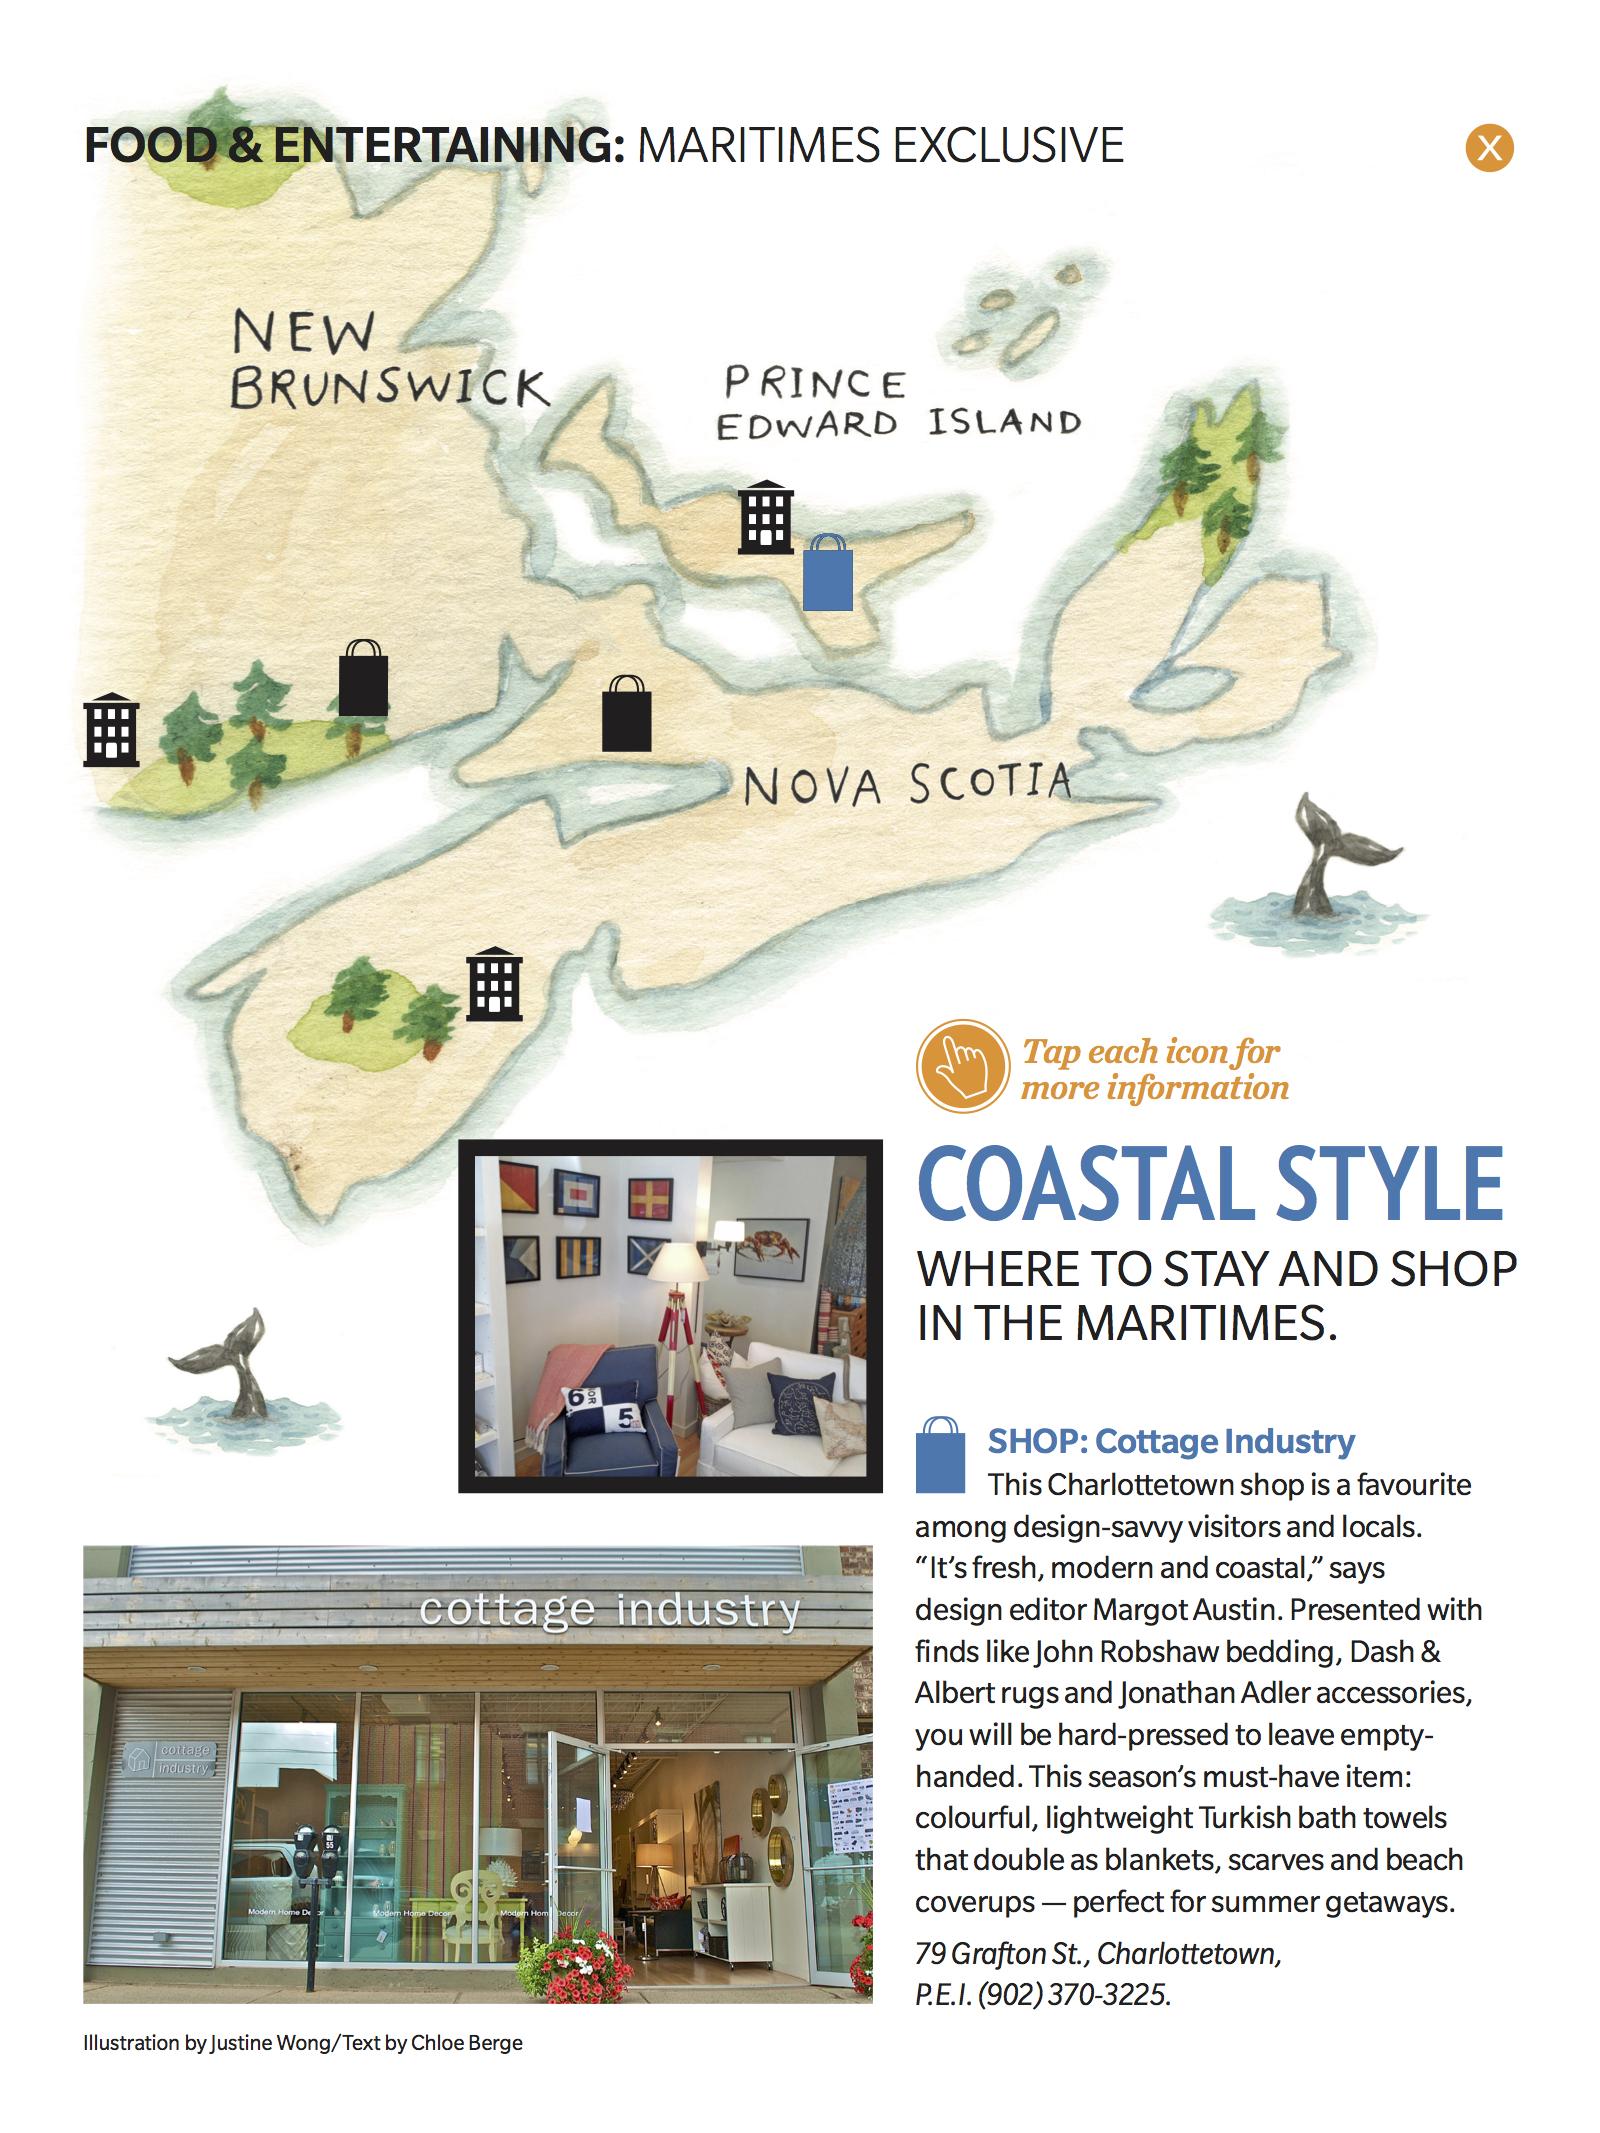 East Coast Travel Guide_House & Home Magazine iPad Edition_July 20144.jpg